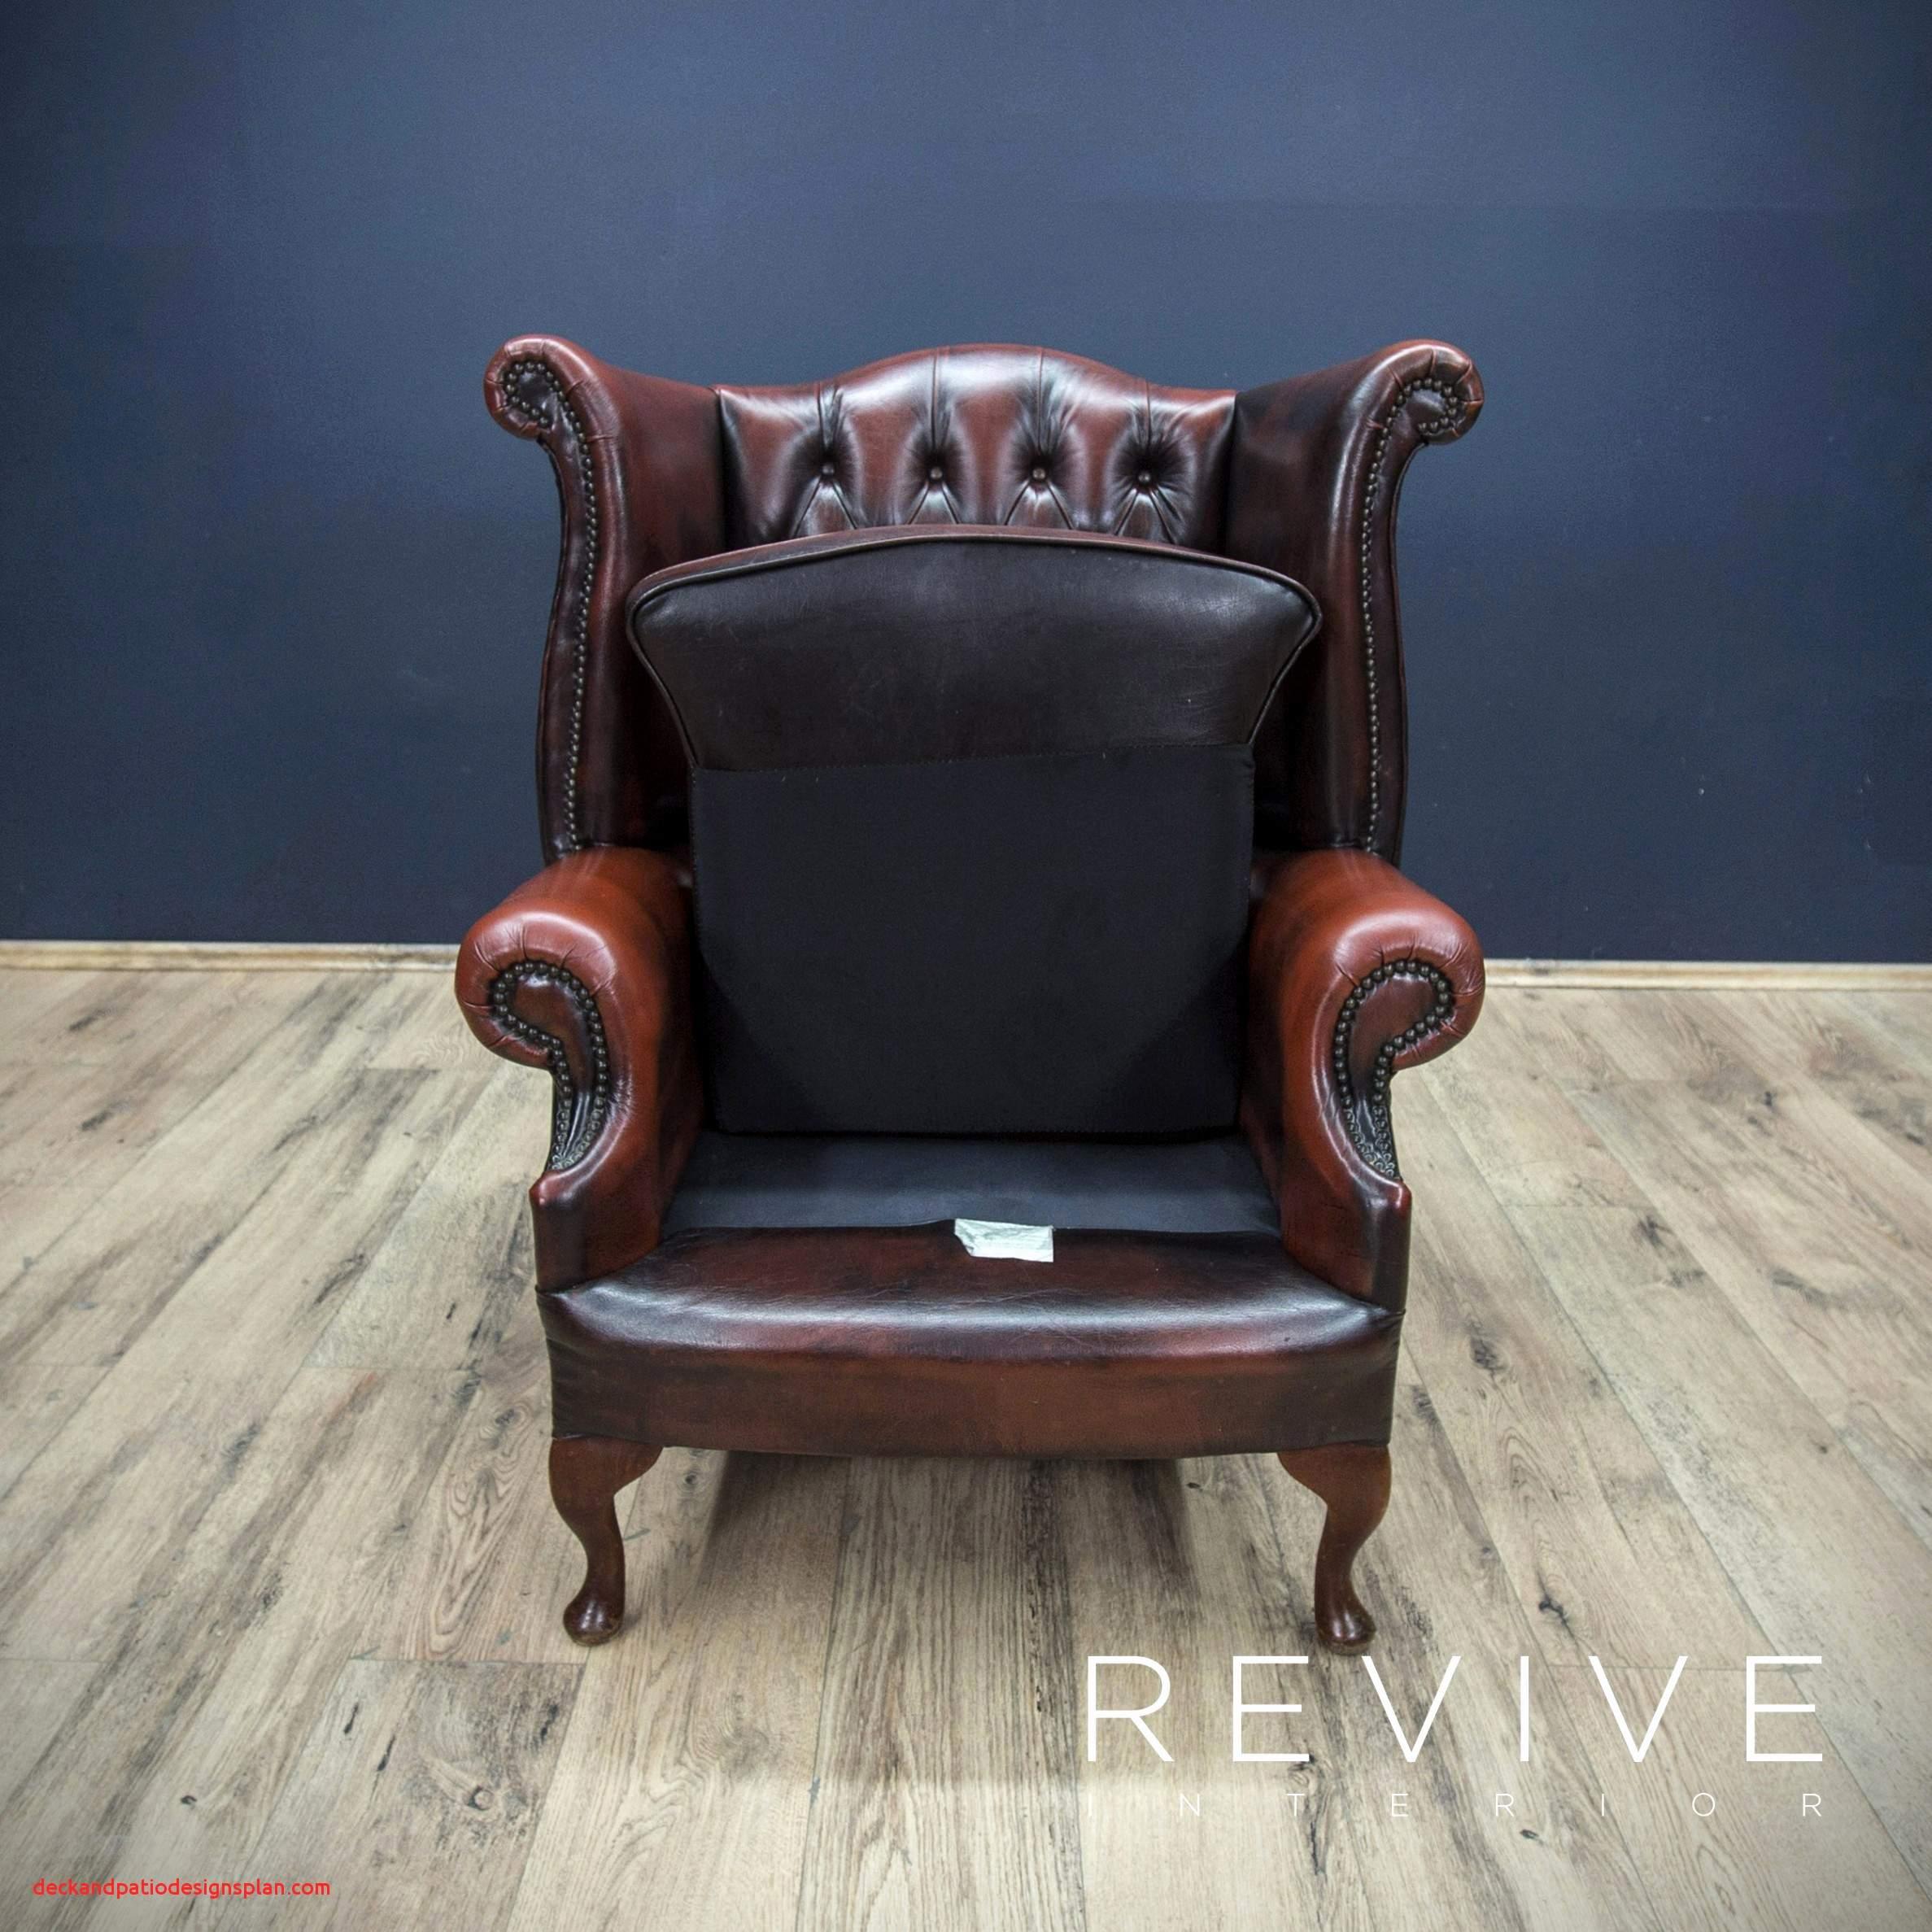 Full Size of Wohnzimmer Sessel Modern Genial 40 Luxus Wohnzimmer Sessel Wohnzimmer Wohnzimmer Sessel